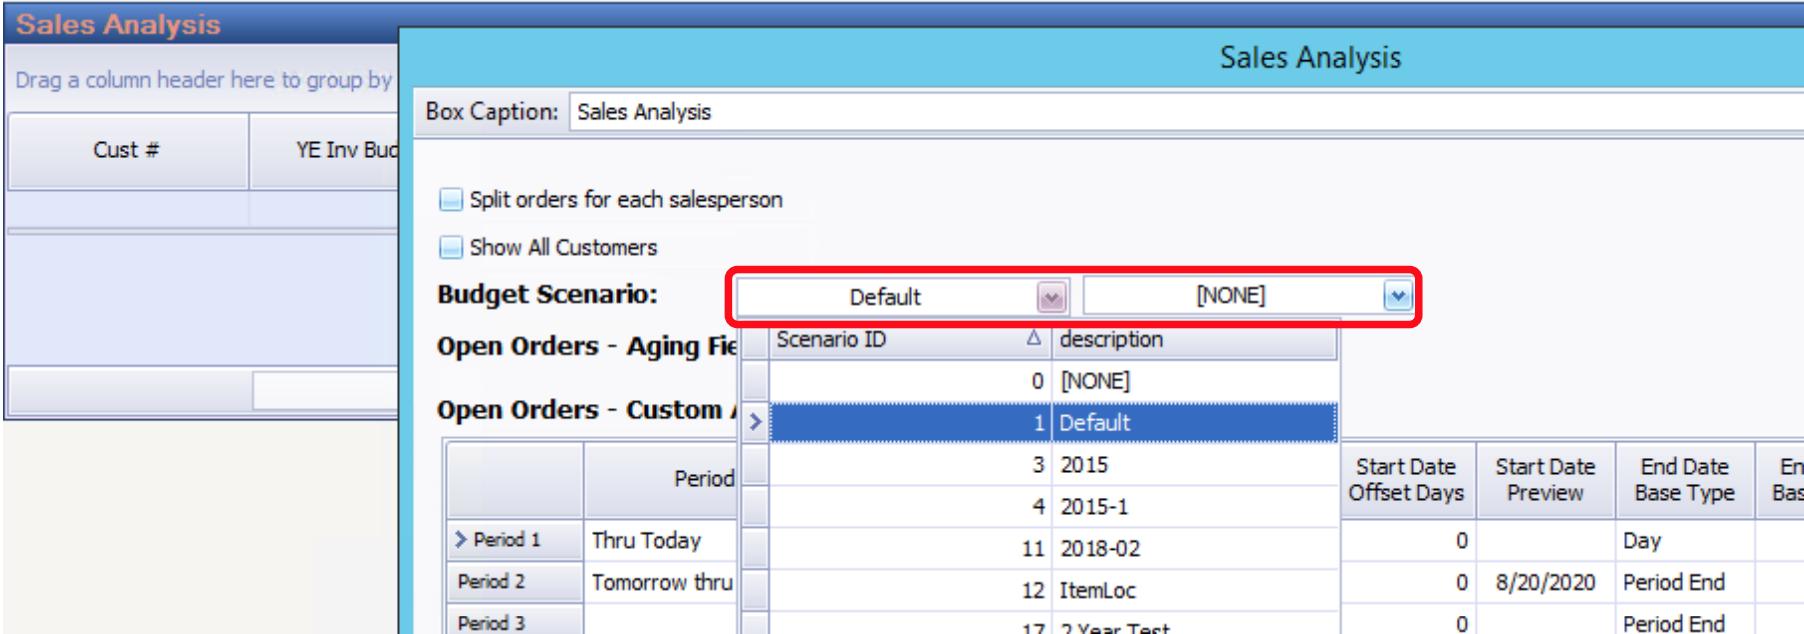 sales analysis budget pulse dashboard